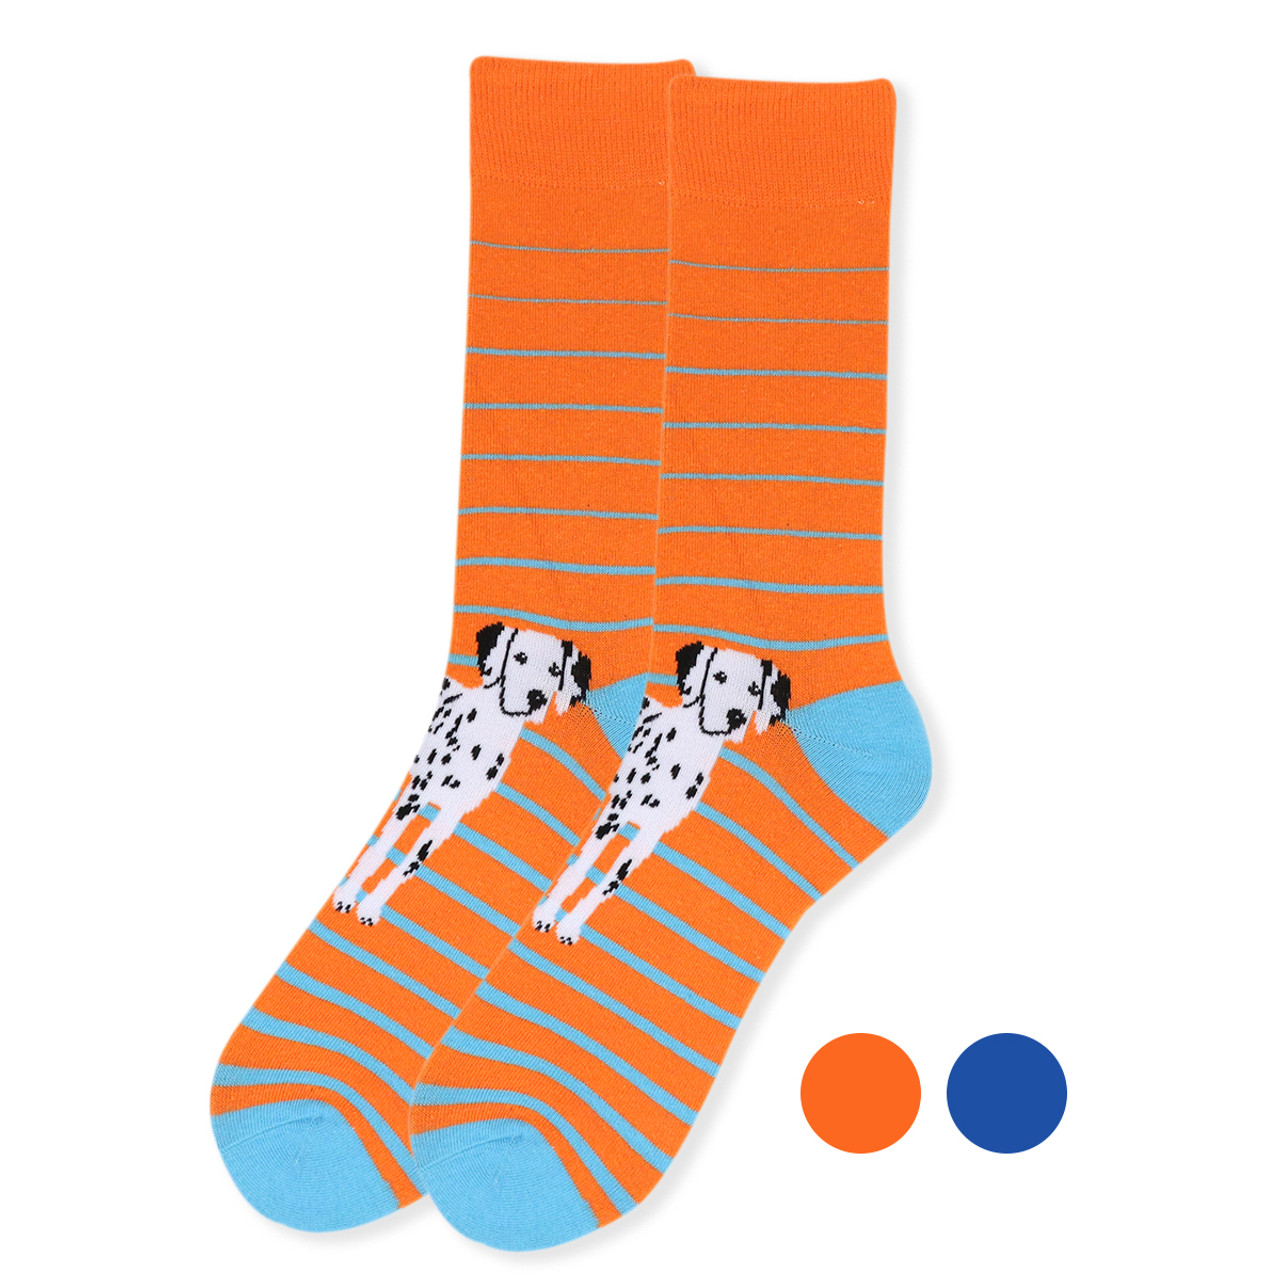 c718dbba8867 Men's Novelty Dalmatian Dogs Socks - NVS19410